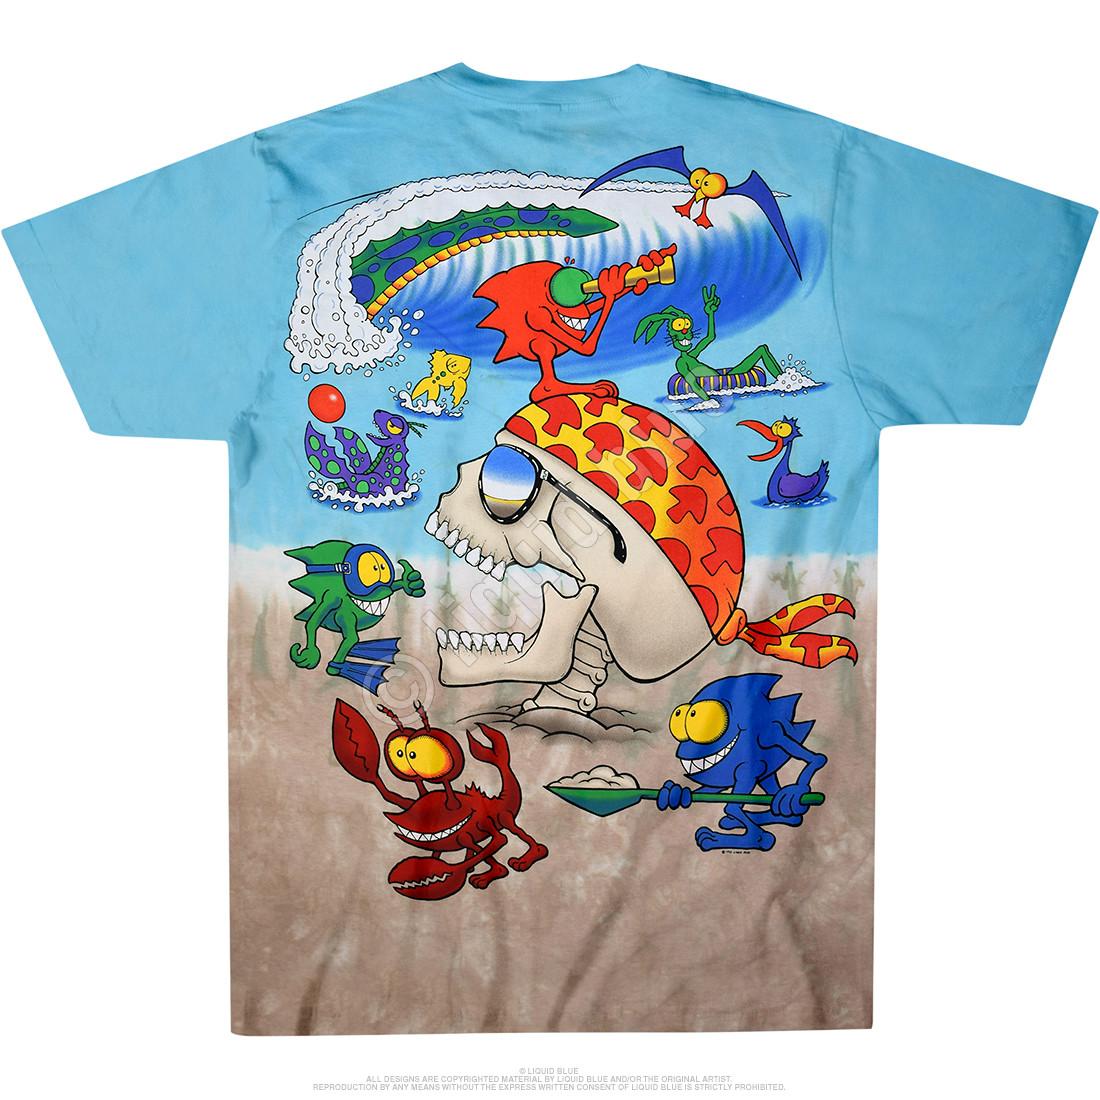 Mars Beach Joey Mars Tie-Dye T-Shirt